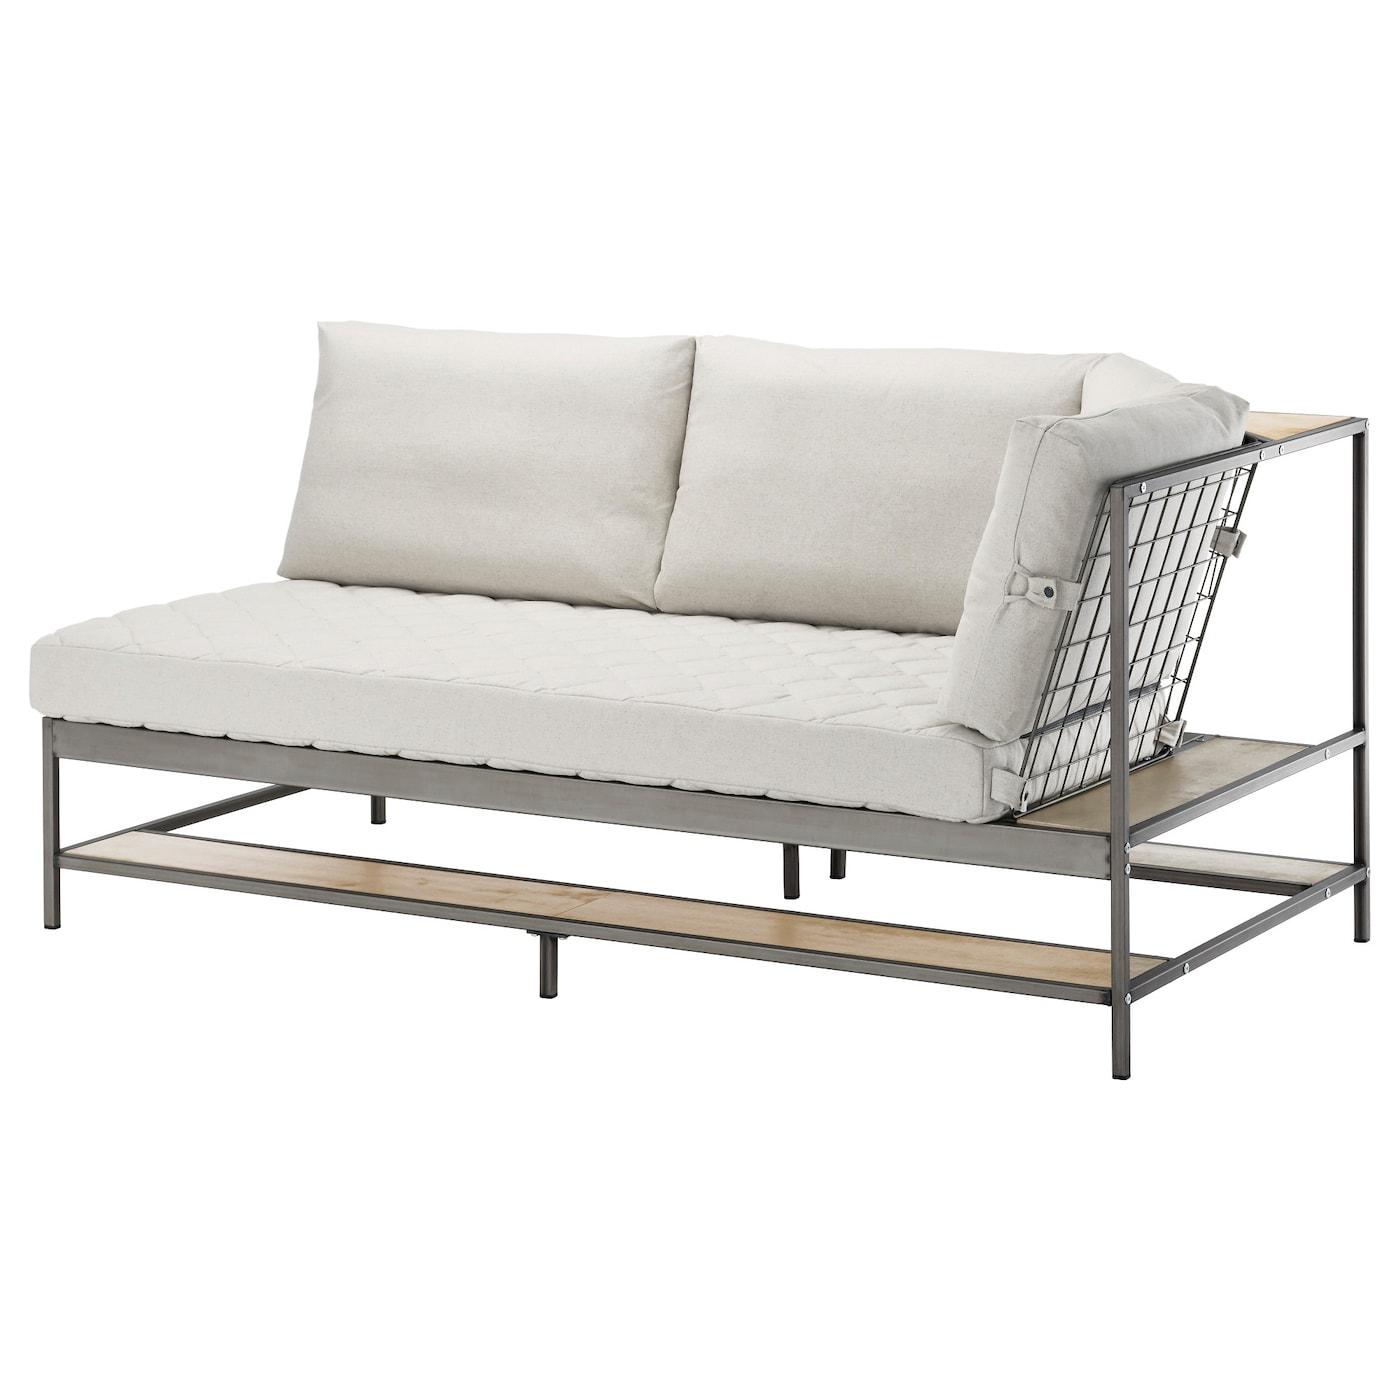 Fabric Sofas | IKEA